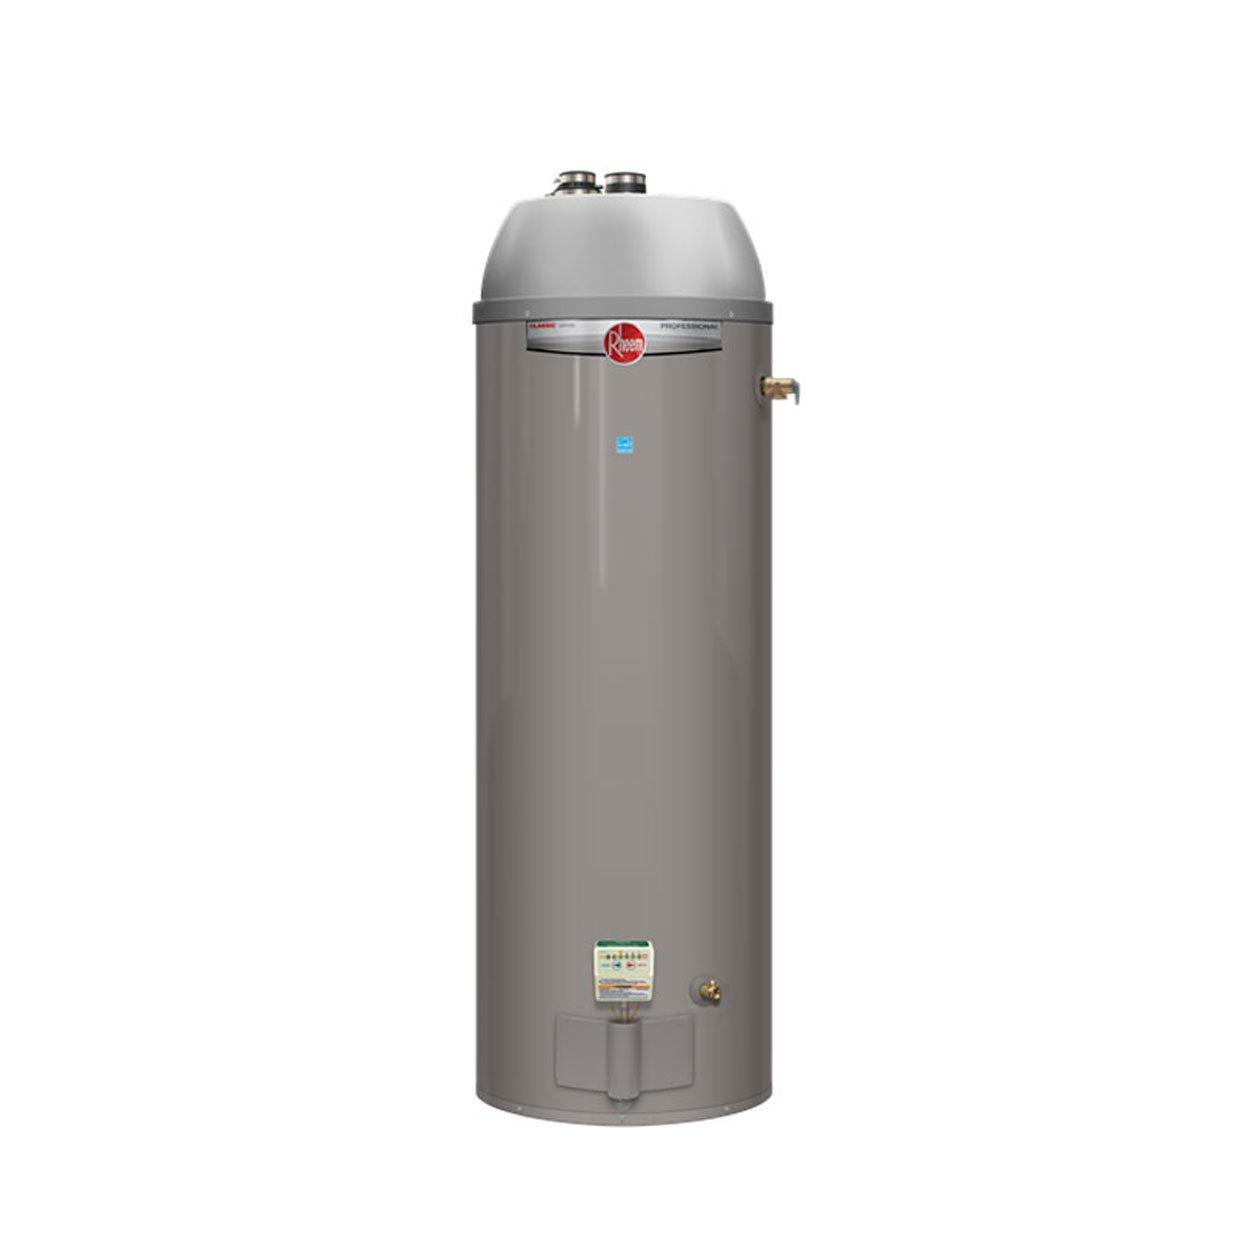 Rheem PROG40-40N RH67 PDV Professional Classic Residential 40K BTU Power Direct Vent Natural Gas Water Heater, 40-Gallon